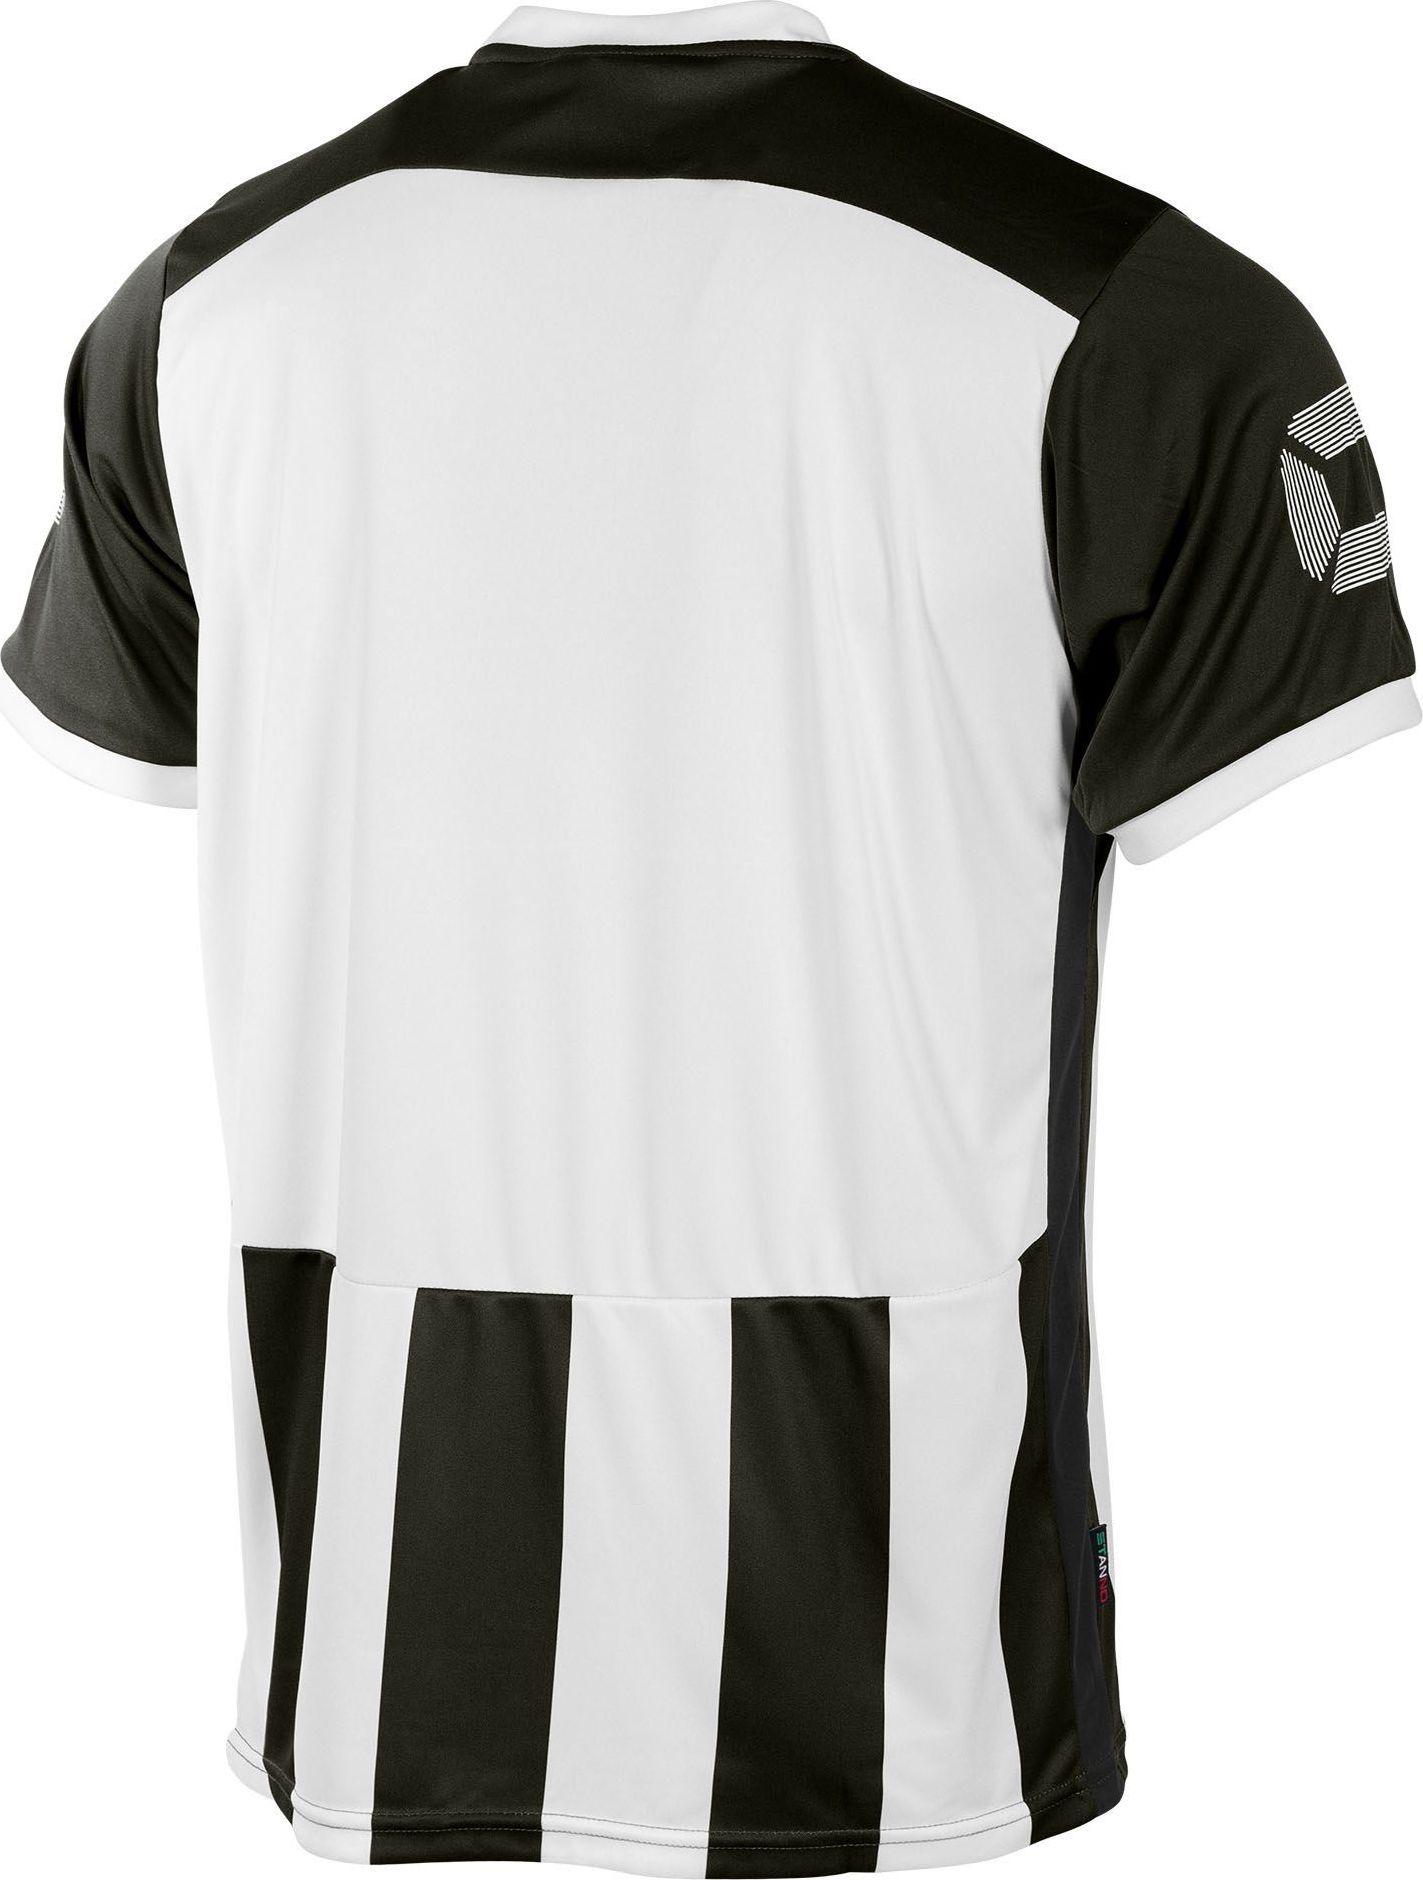 acf50b976e42d4 Stanno Brighton Shirt Korte Mouw - Zwart / Wit